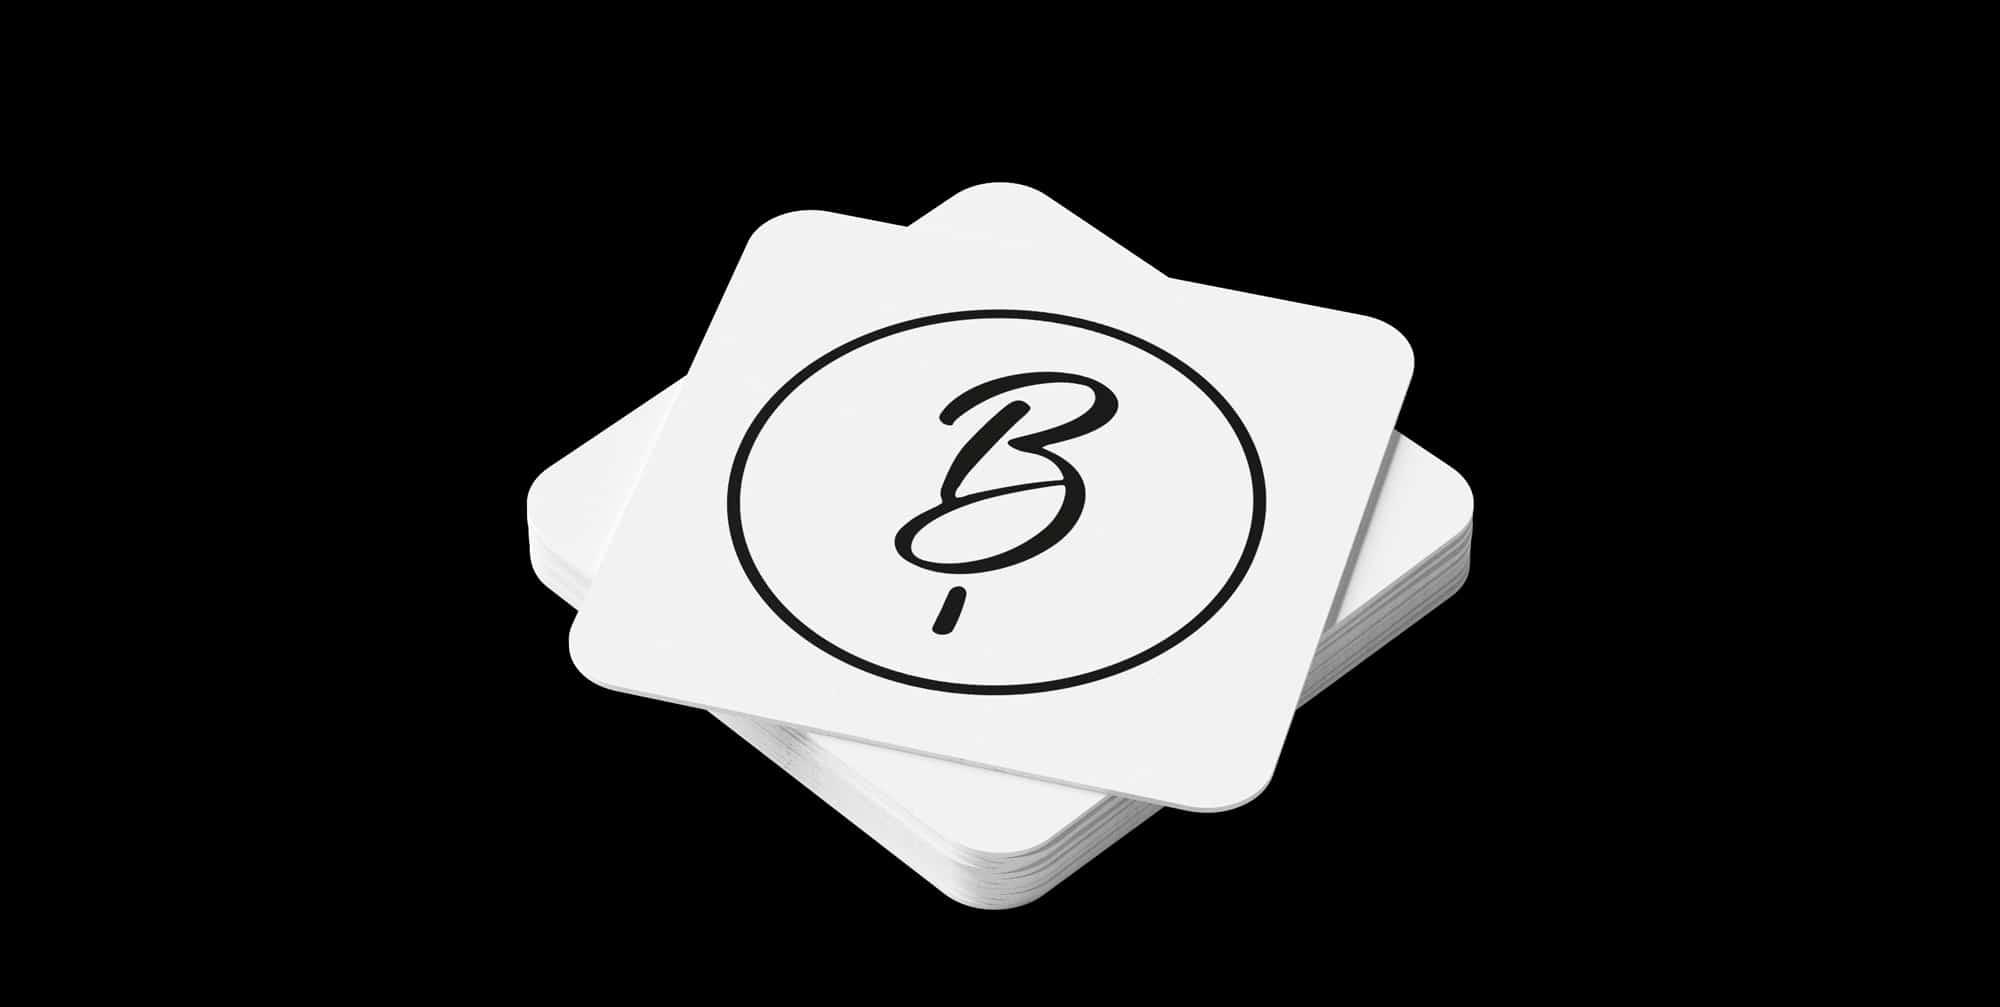 planx-LogoDesign-Gruenerbaum-Coaster01